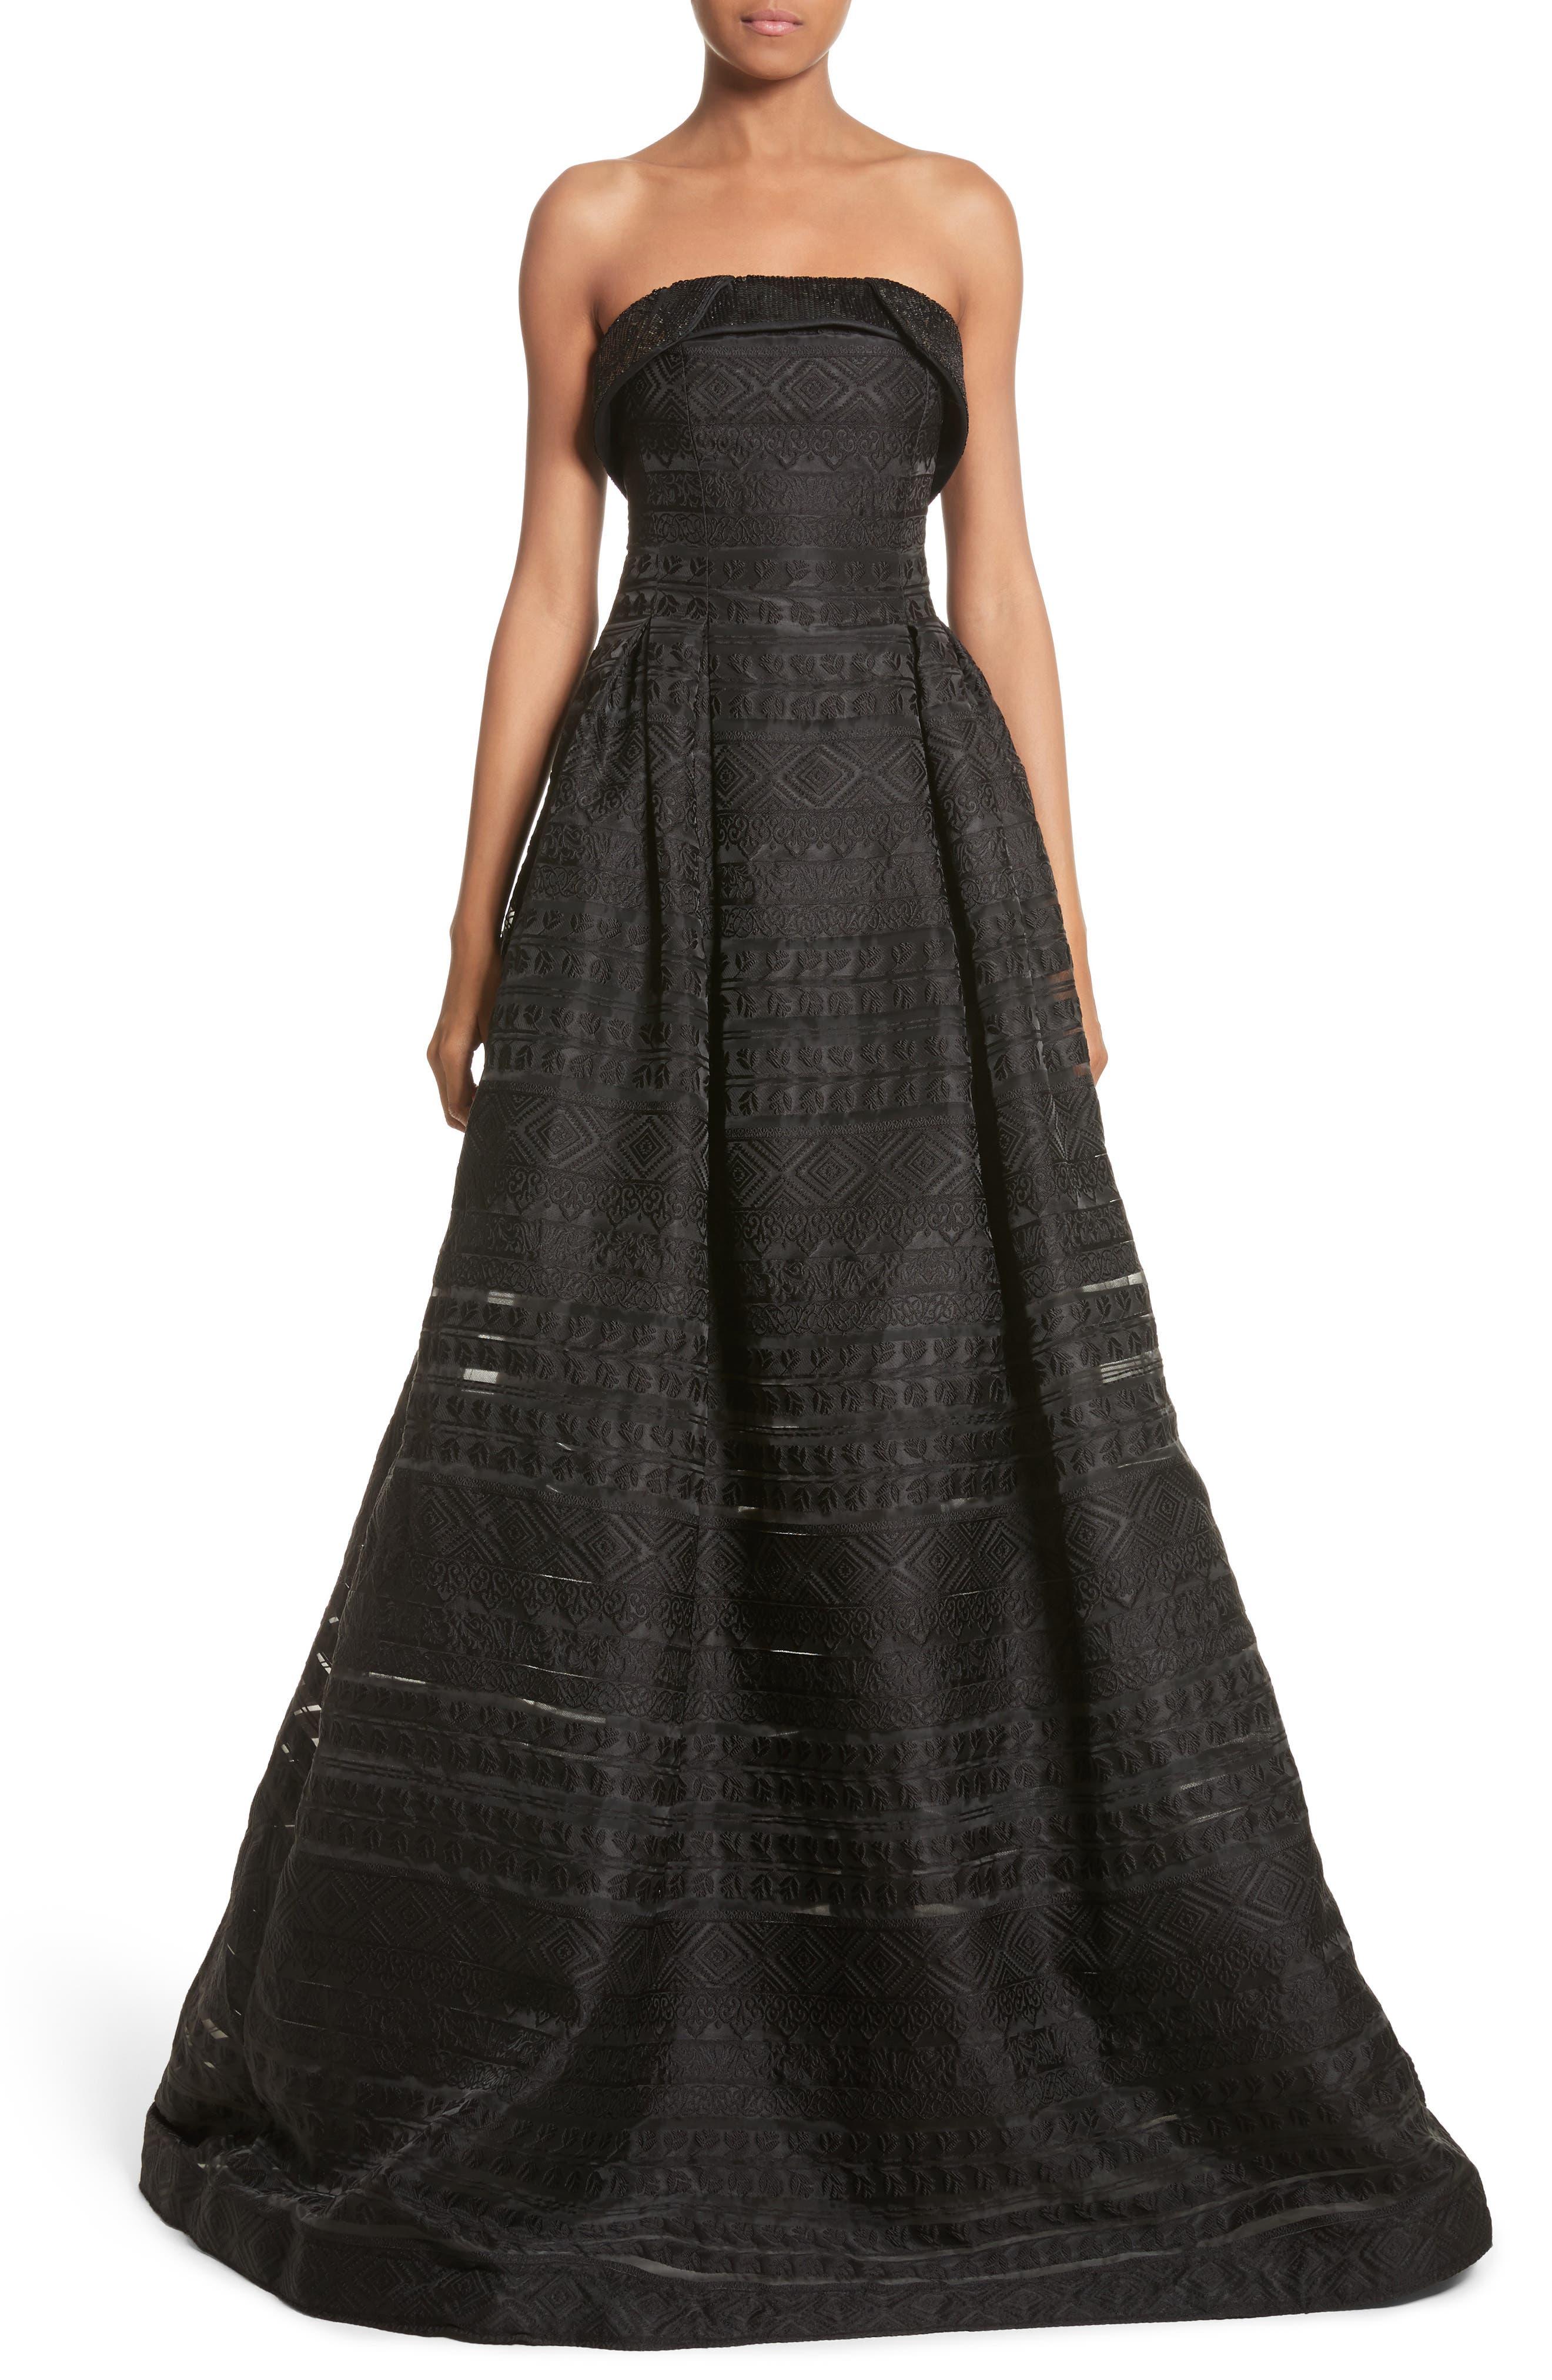 Alternate Image 1 Selected - Sachin & Babi Noir Istiklal Embellished Strapless Ballgown